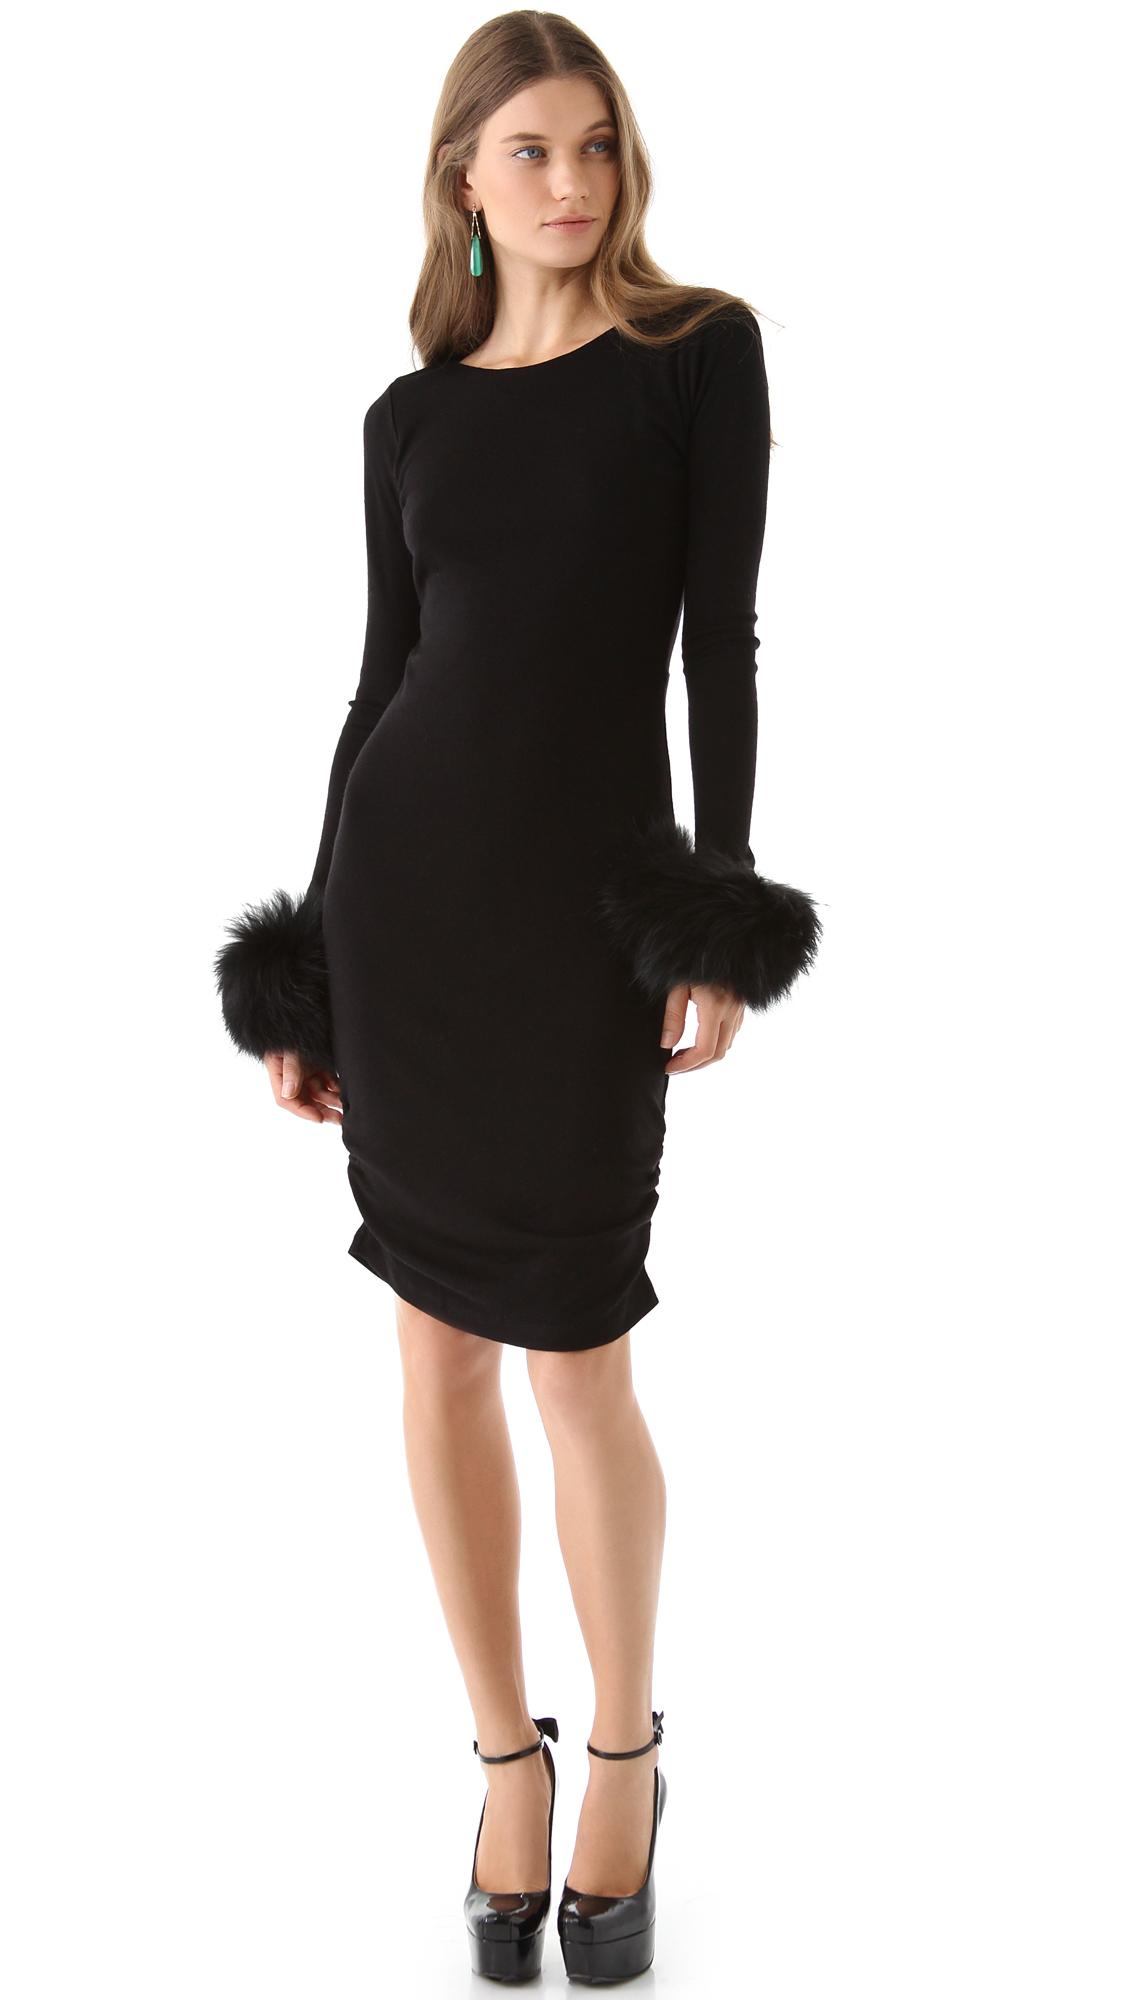 Alice Olivia Dress Alesia Fur Cuff In Black Black Black